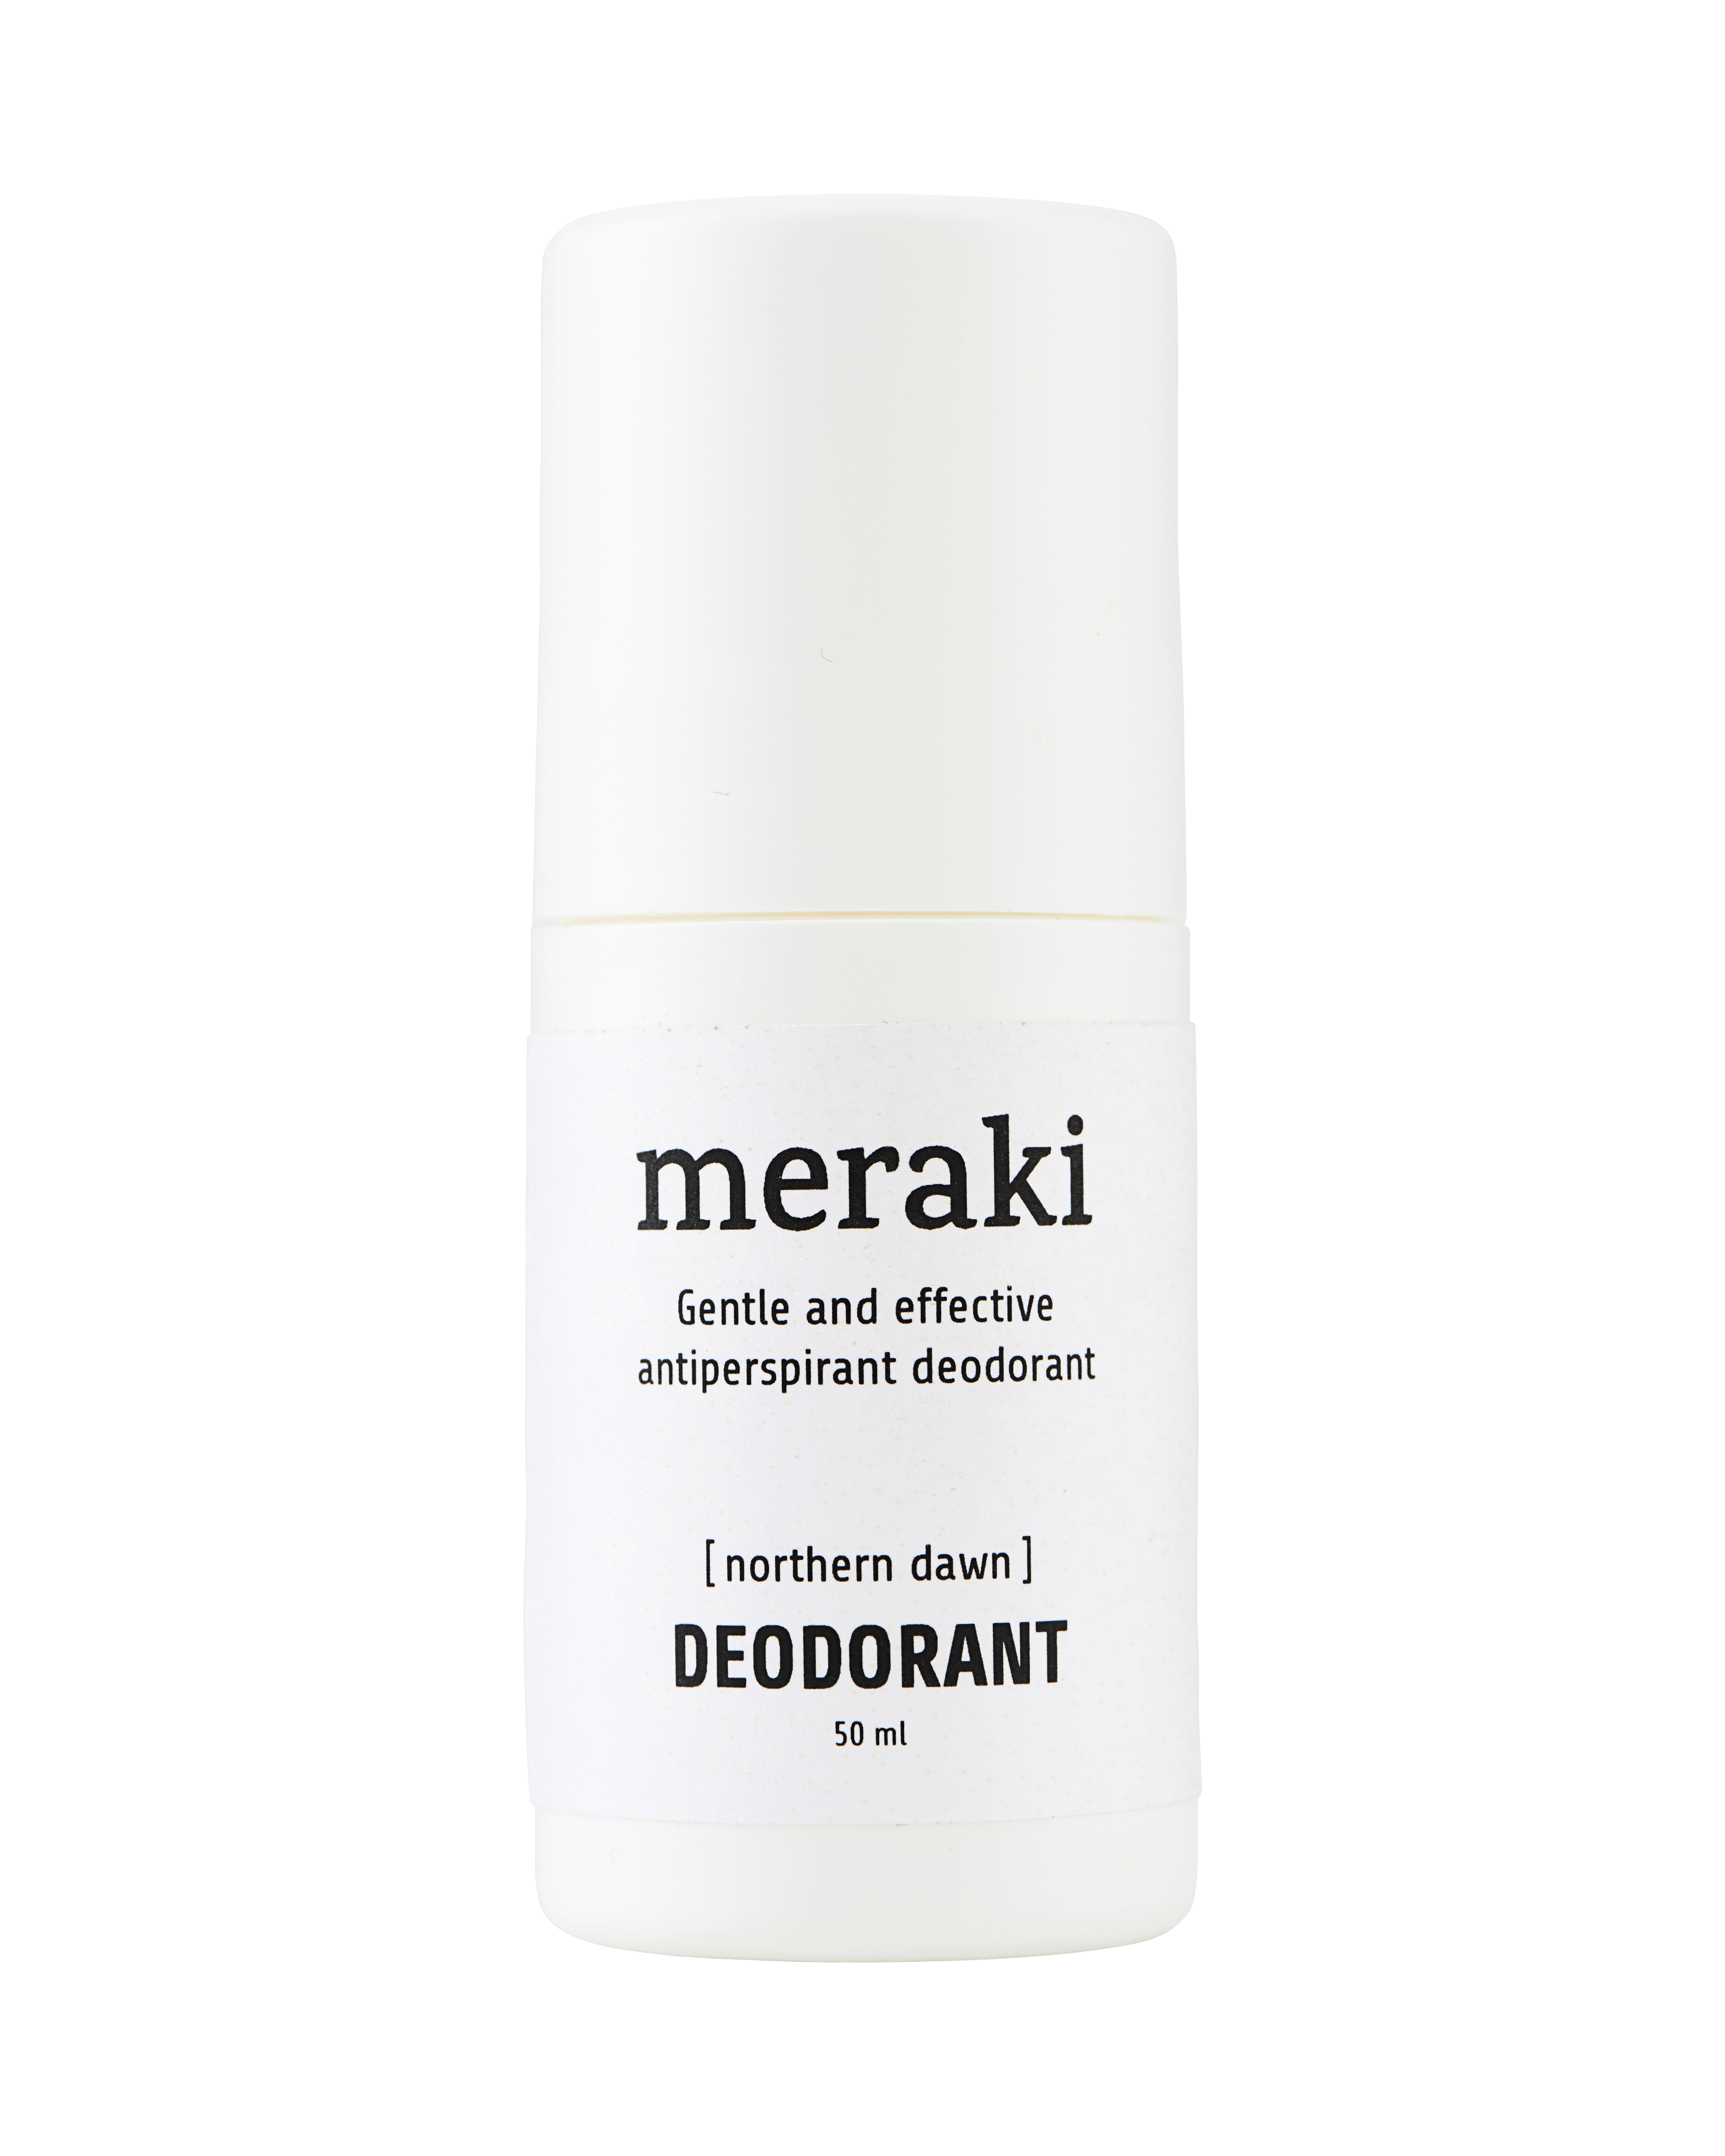 Meraki Deodorant Northern Dawn